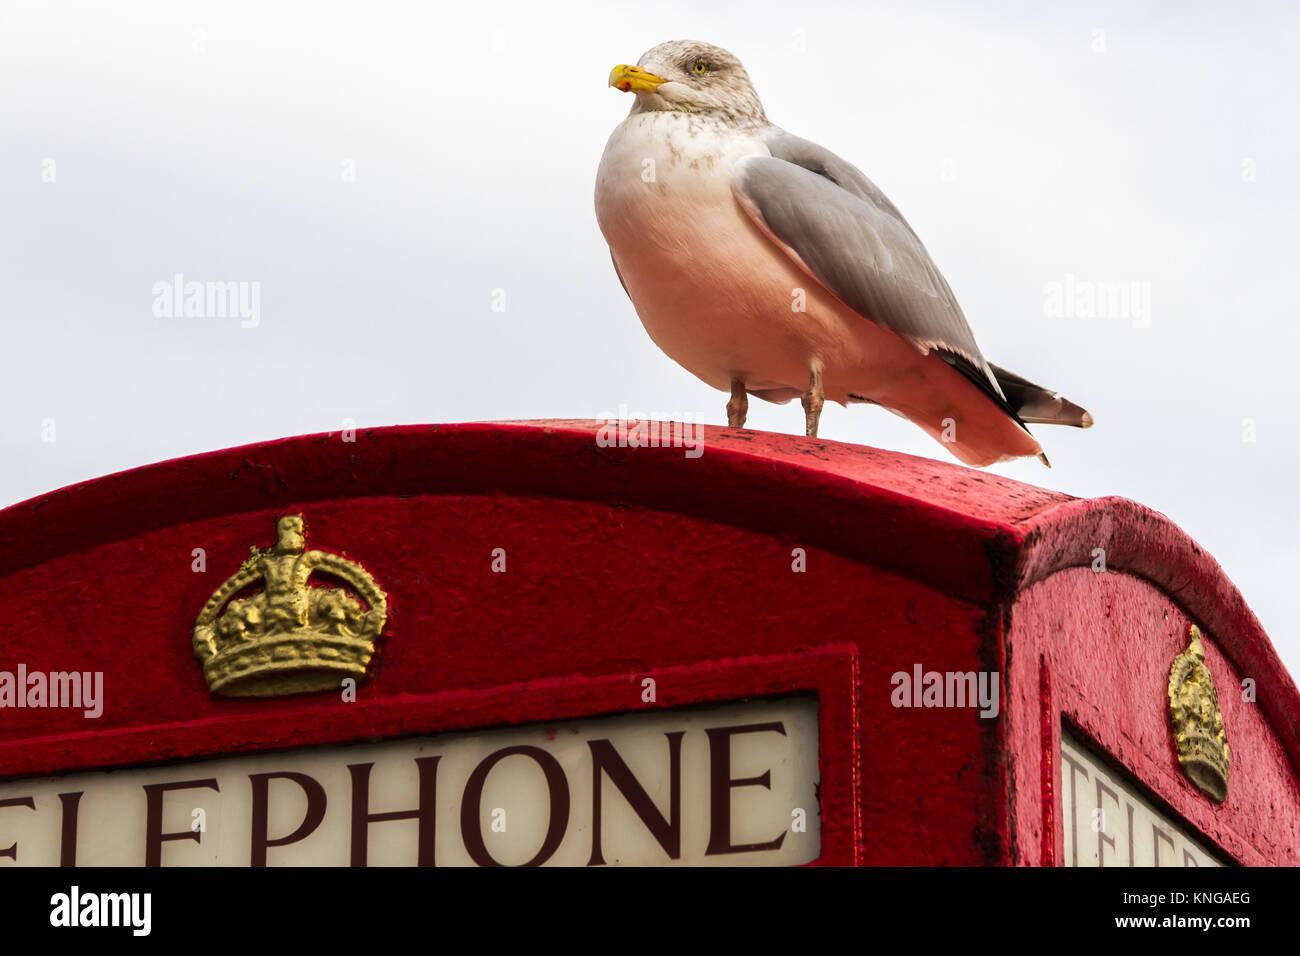 A seagull sat on top of a K6 model Telephone Kiosk at Brixham Harbour. Brixham, Torbay, Devon, UK - Stock Image